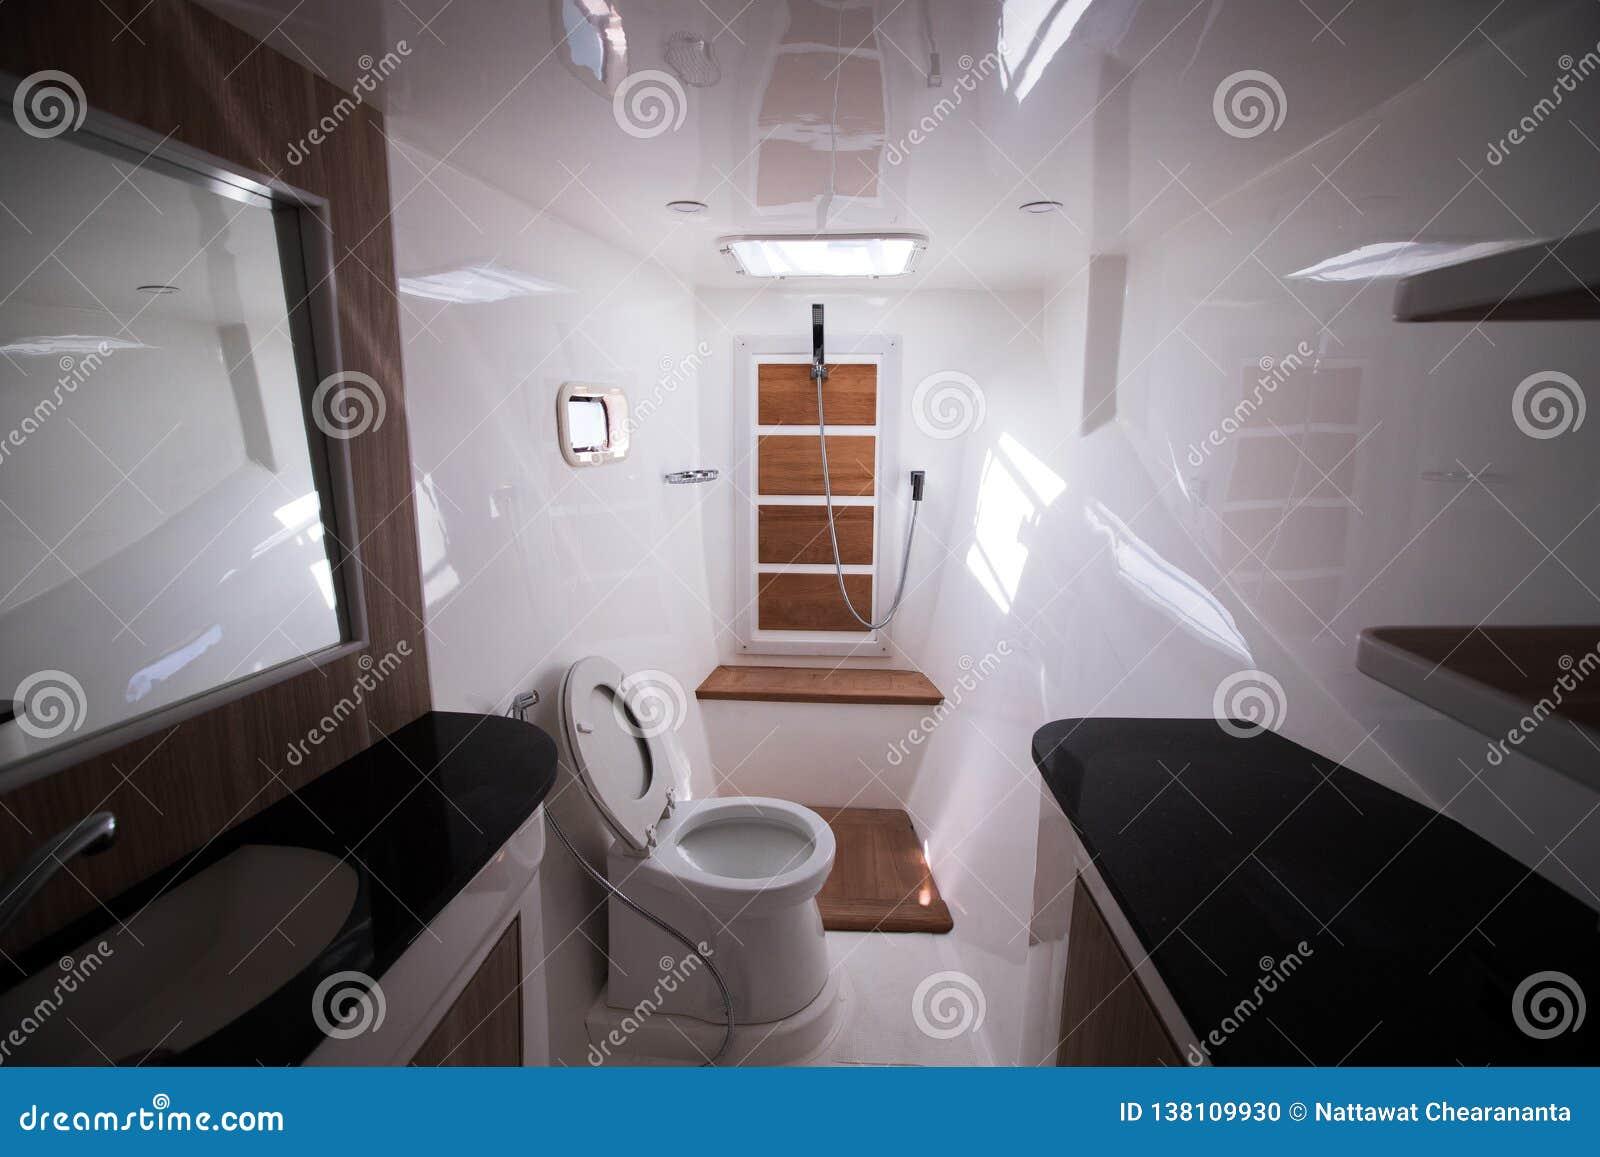 White Toilet restroom inside Yacht cruise windows